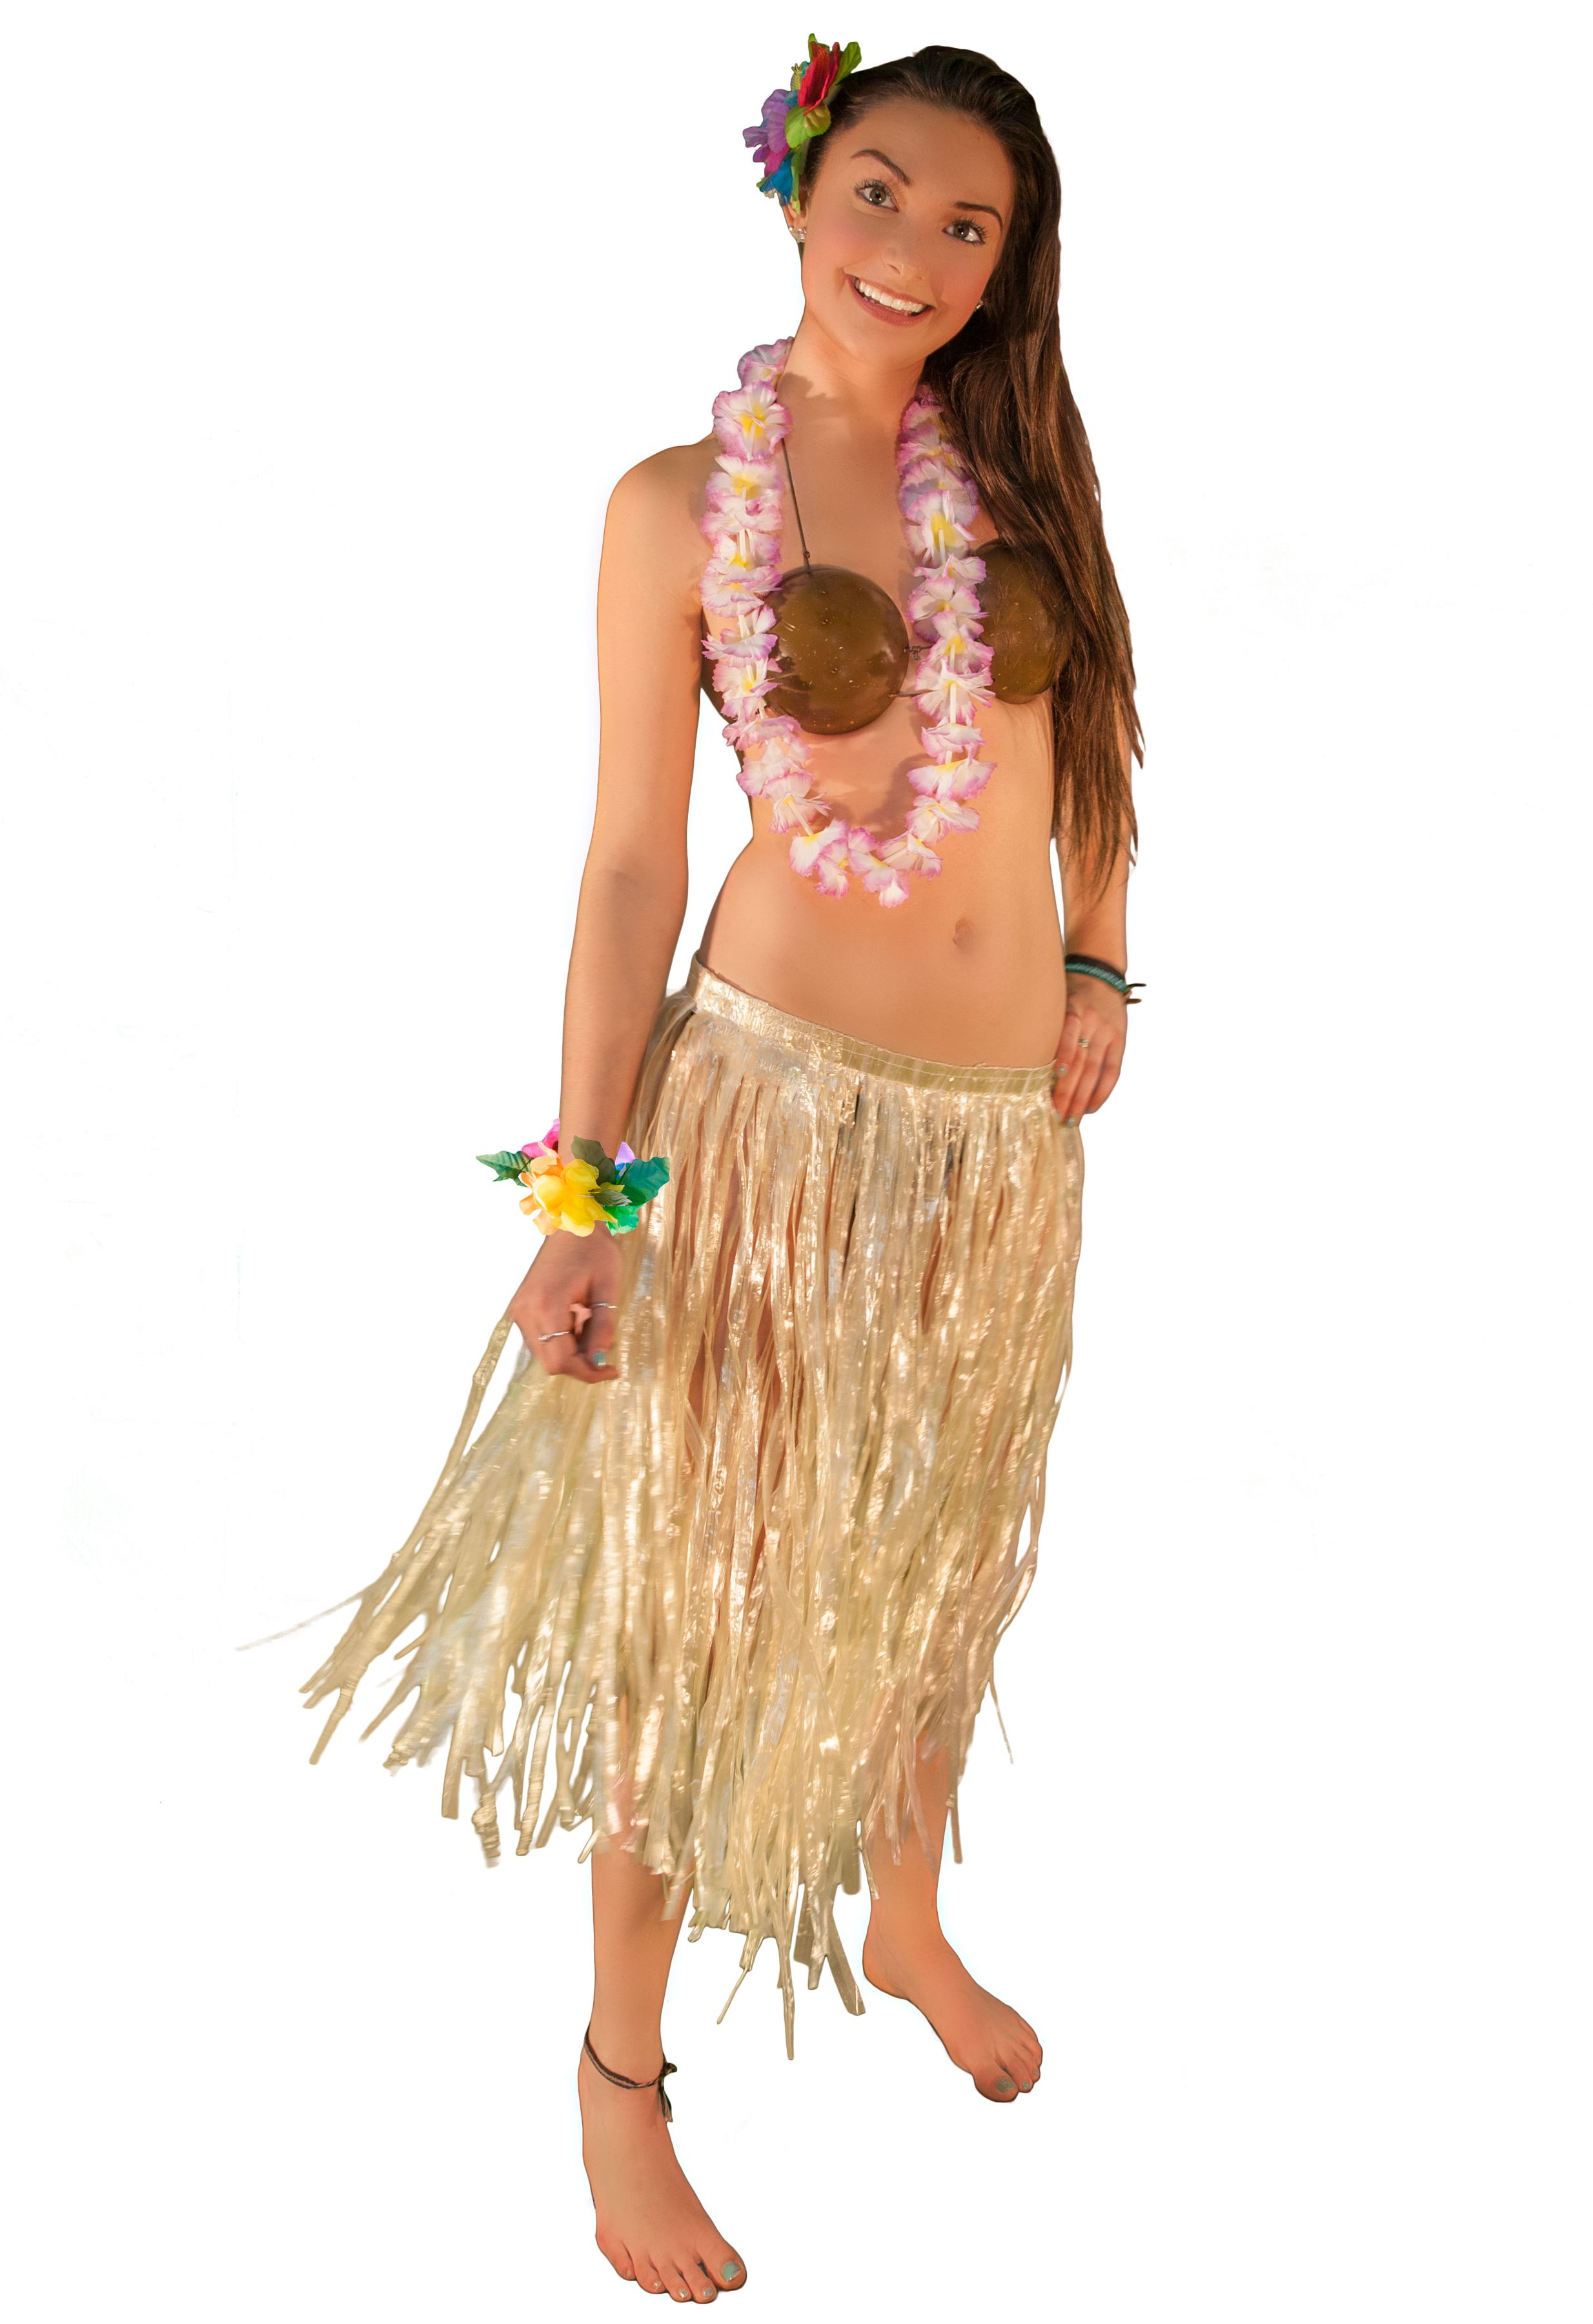 Shell Bra Hawaiian Luau Hula Girl Fancy Dress Halloween Adult Costume Accessory